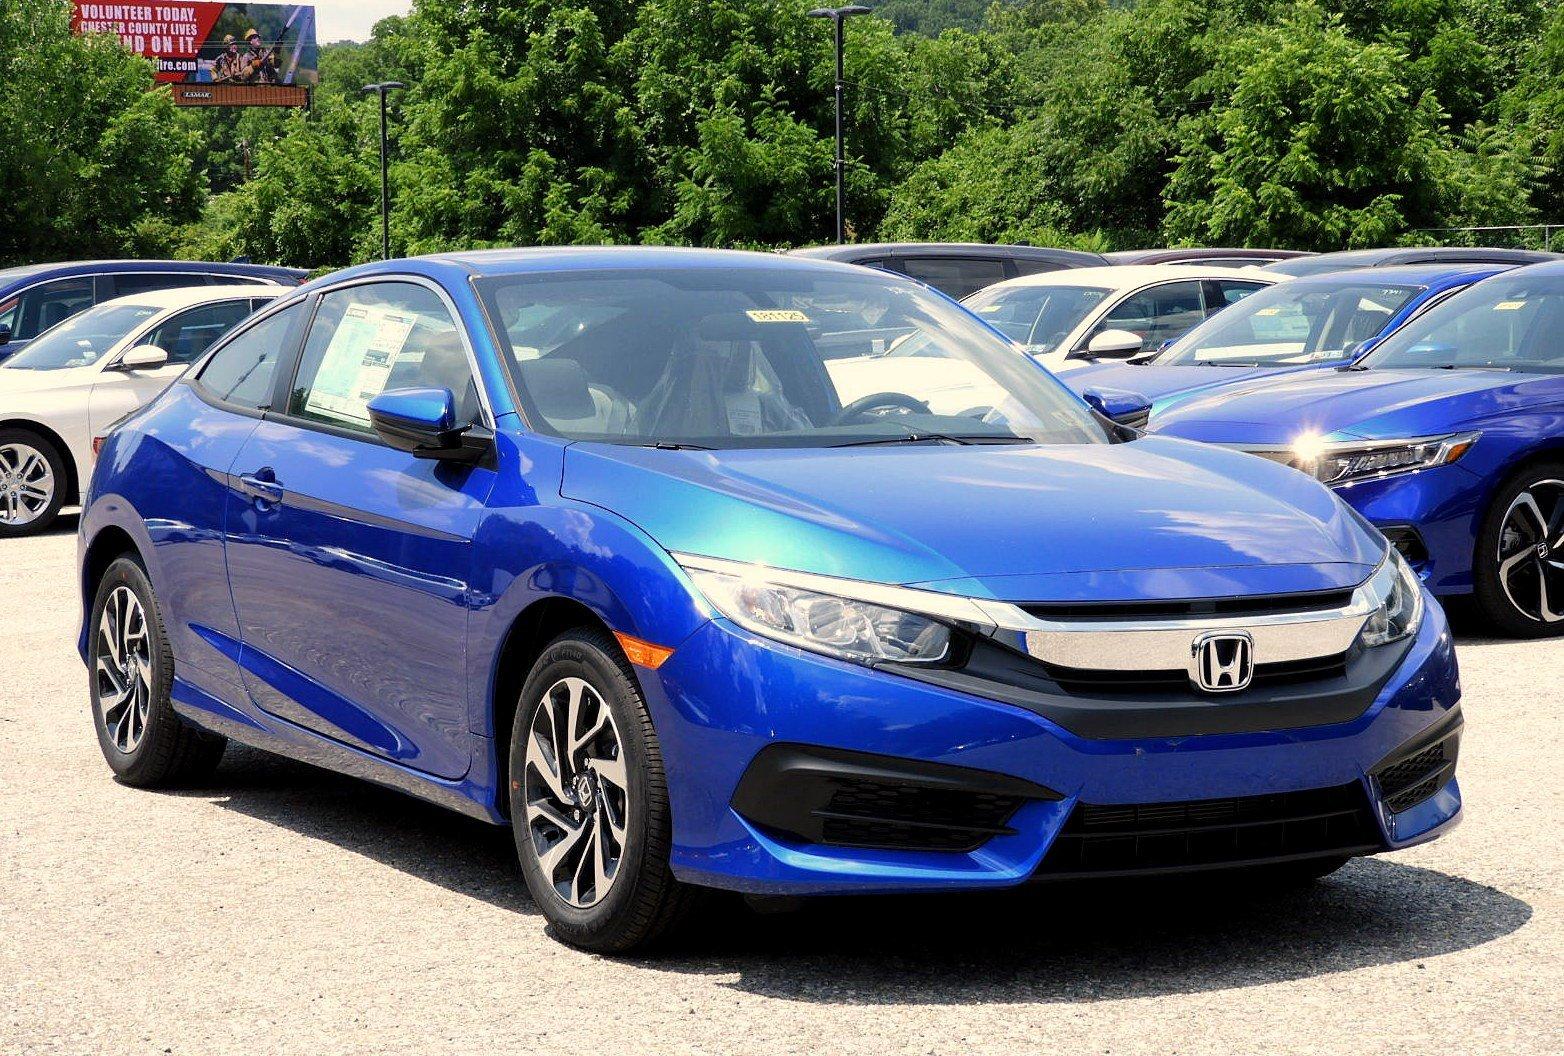 New 2018 Honda Civic LX Manual Aegean Blue Metallic For Sale in Downingtown  PA | Stock:181125-R